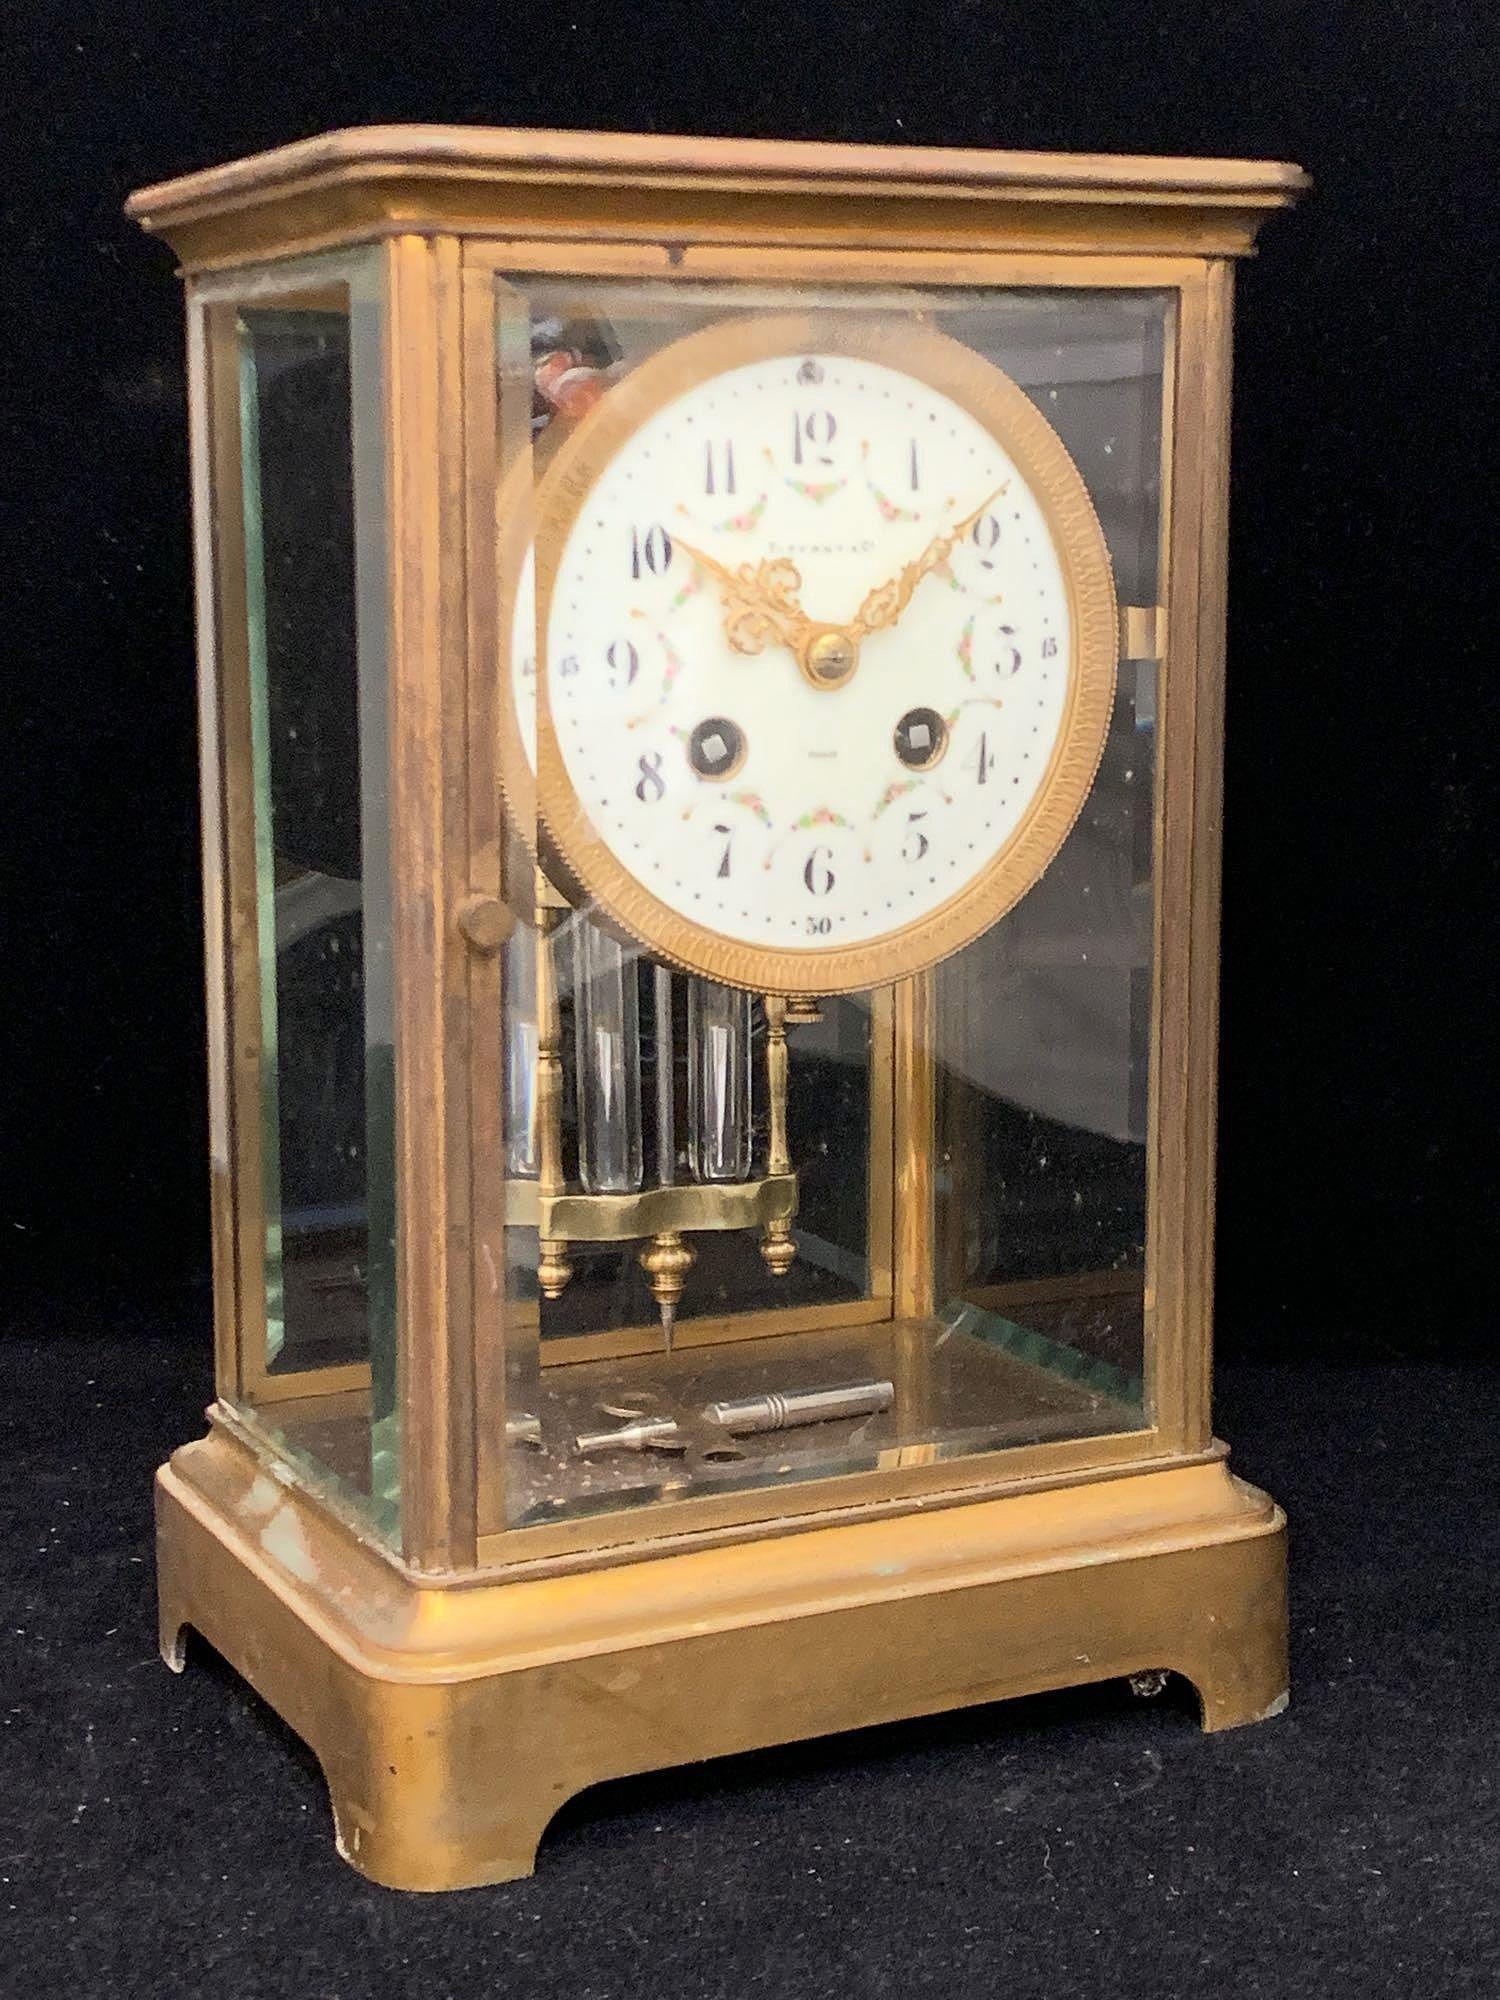 Tiffany & Co. Crystal Regulator Shelf Clock